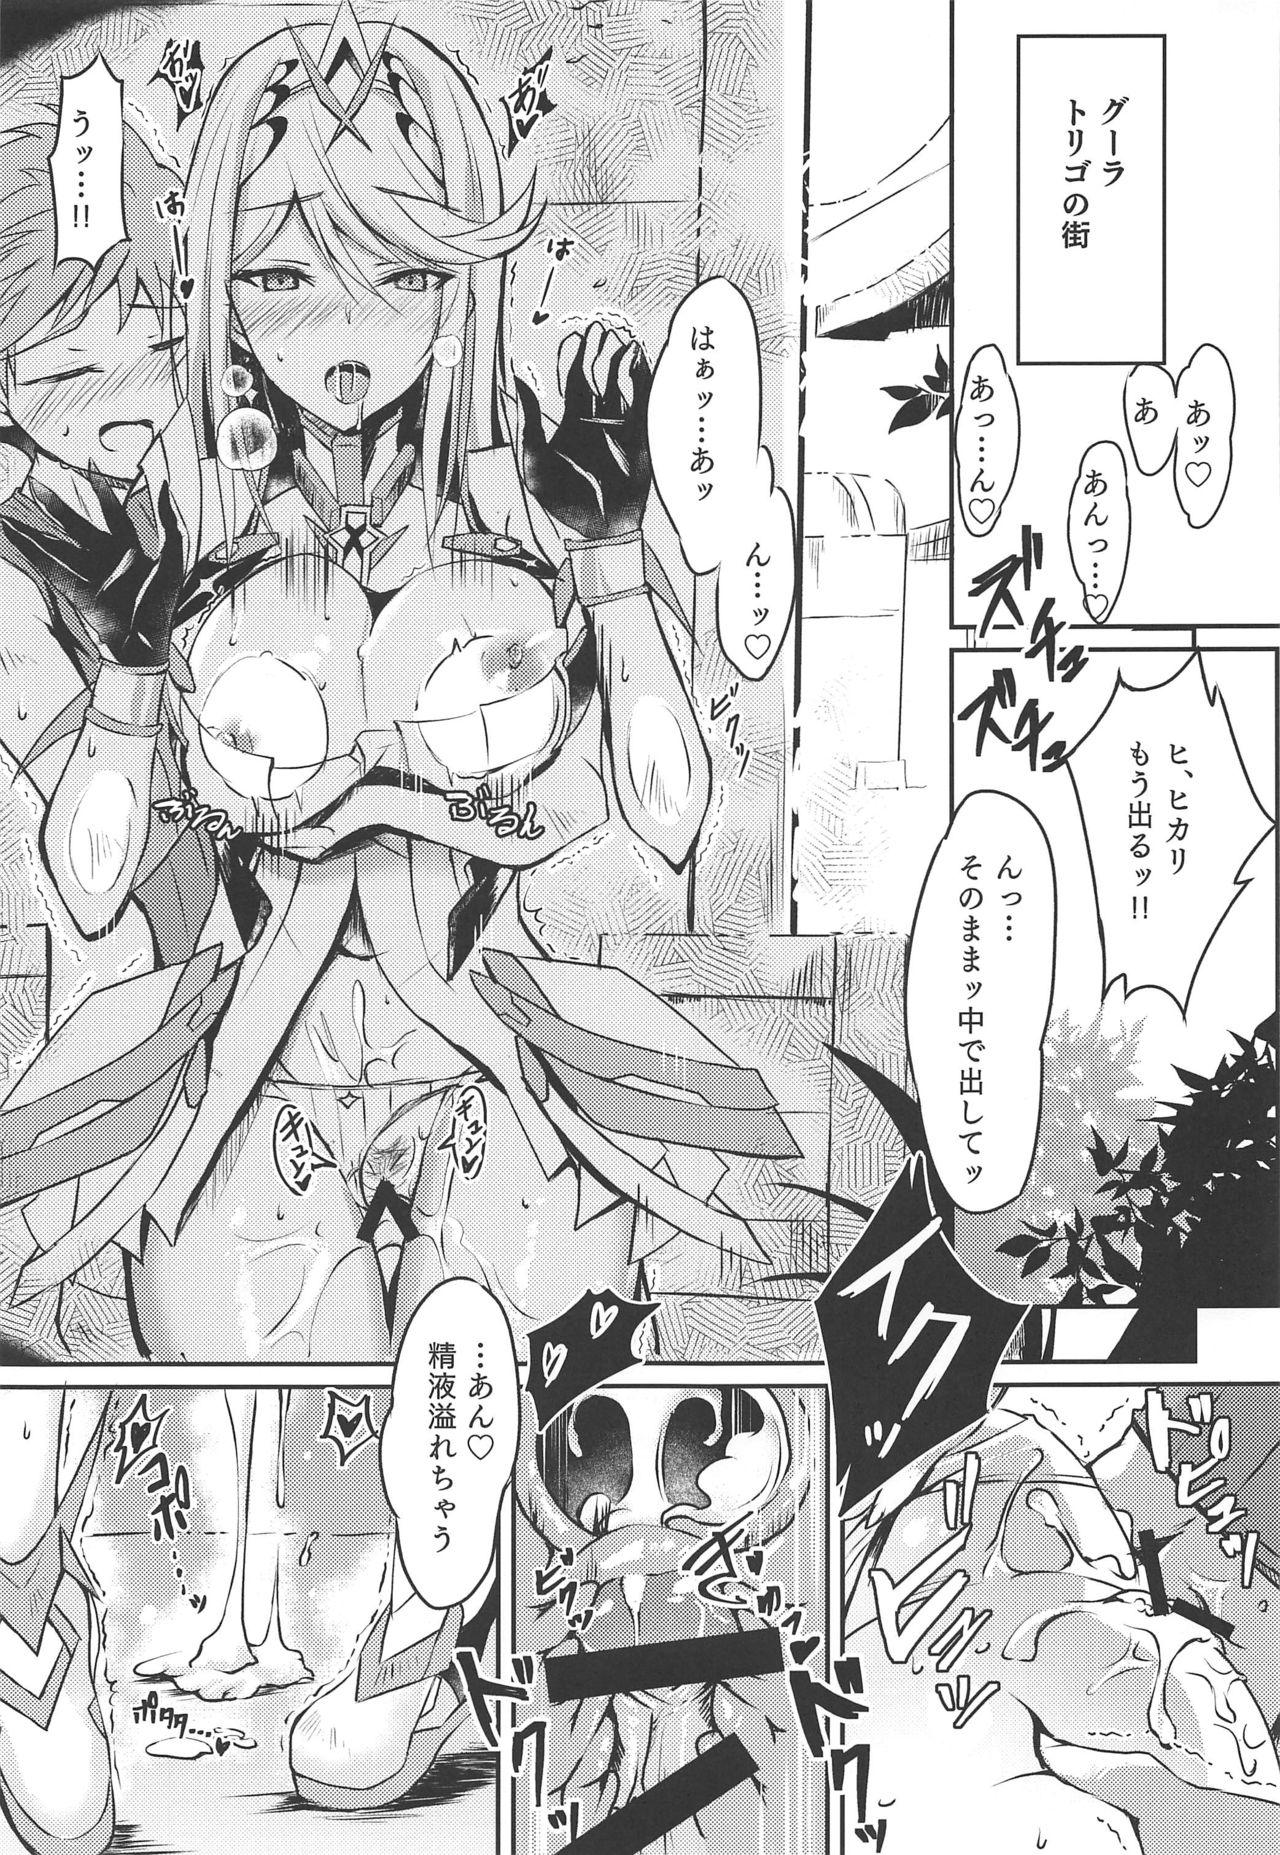 Hikari-chan no Ecchi Hon 3